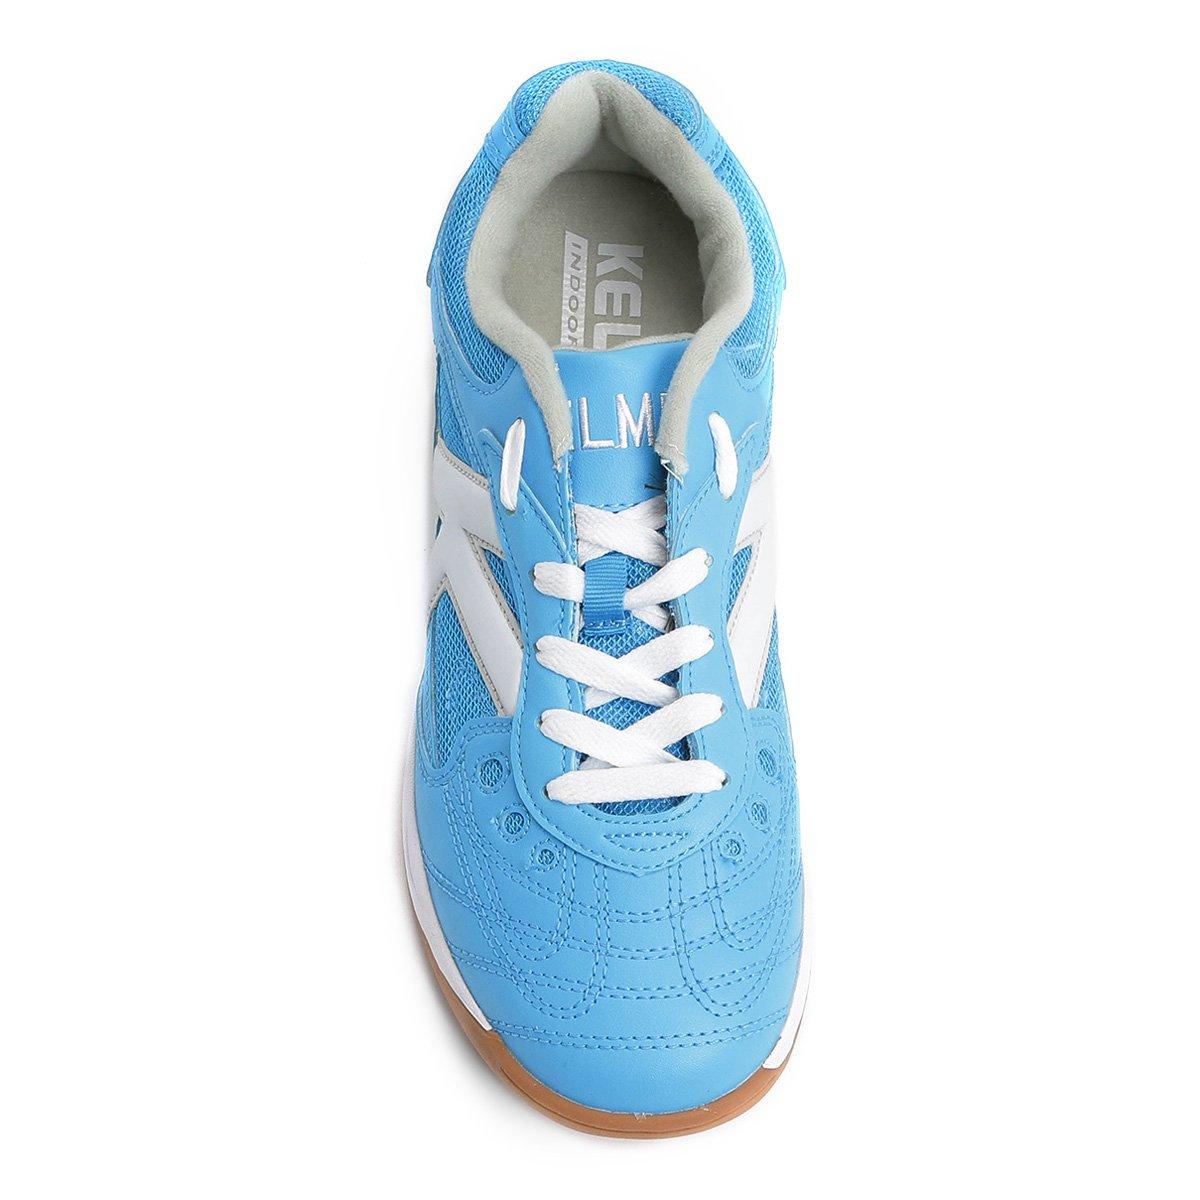 27b9d54a80 Chuteira Futsal Kelme Copa - Compre Agora